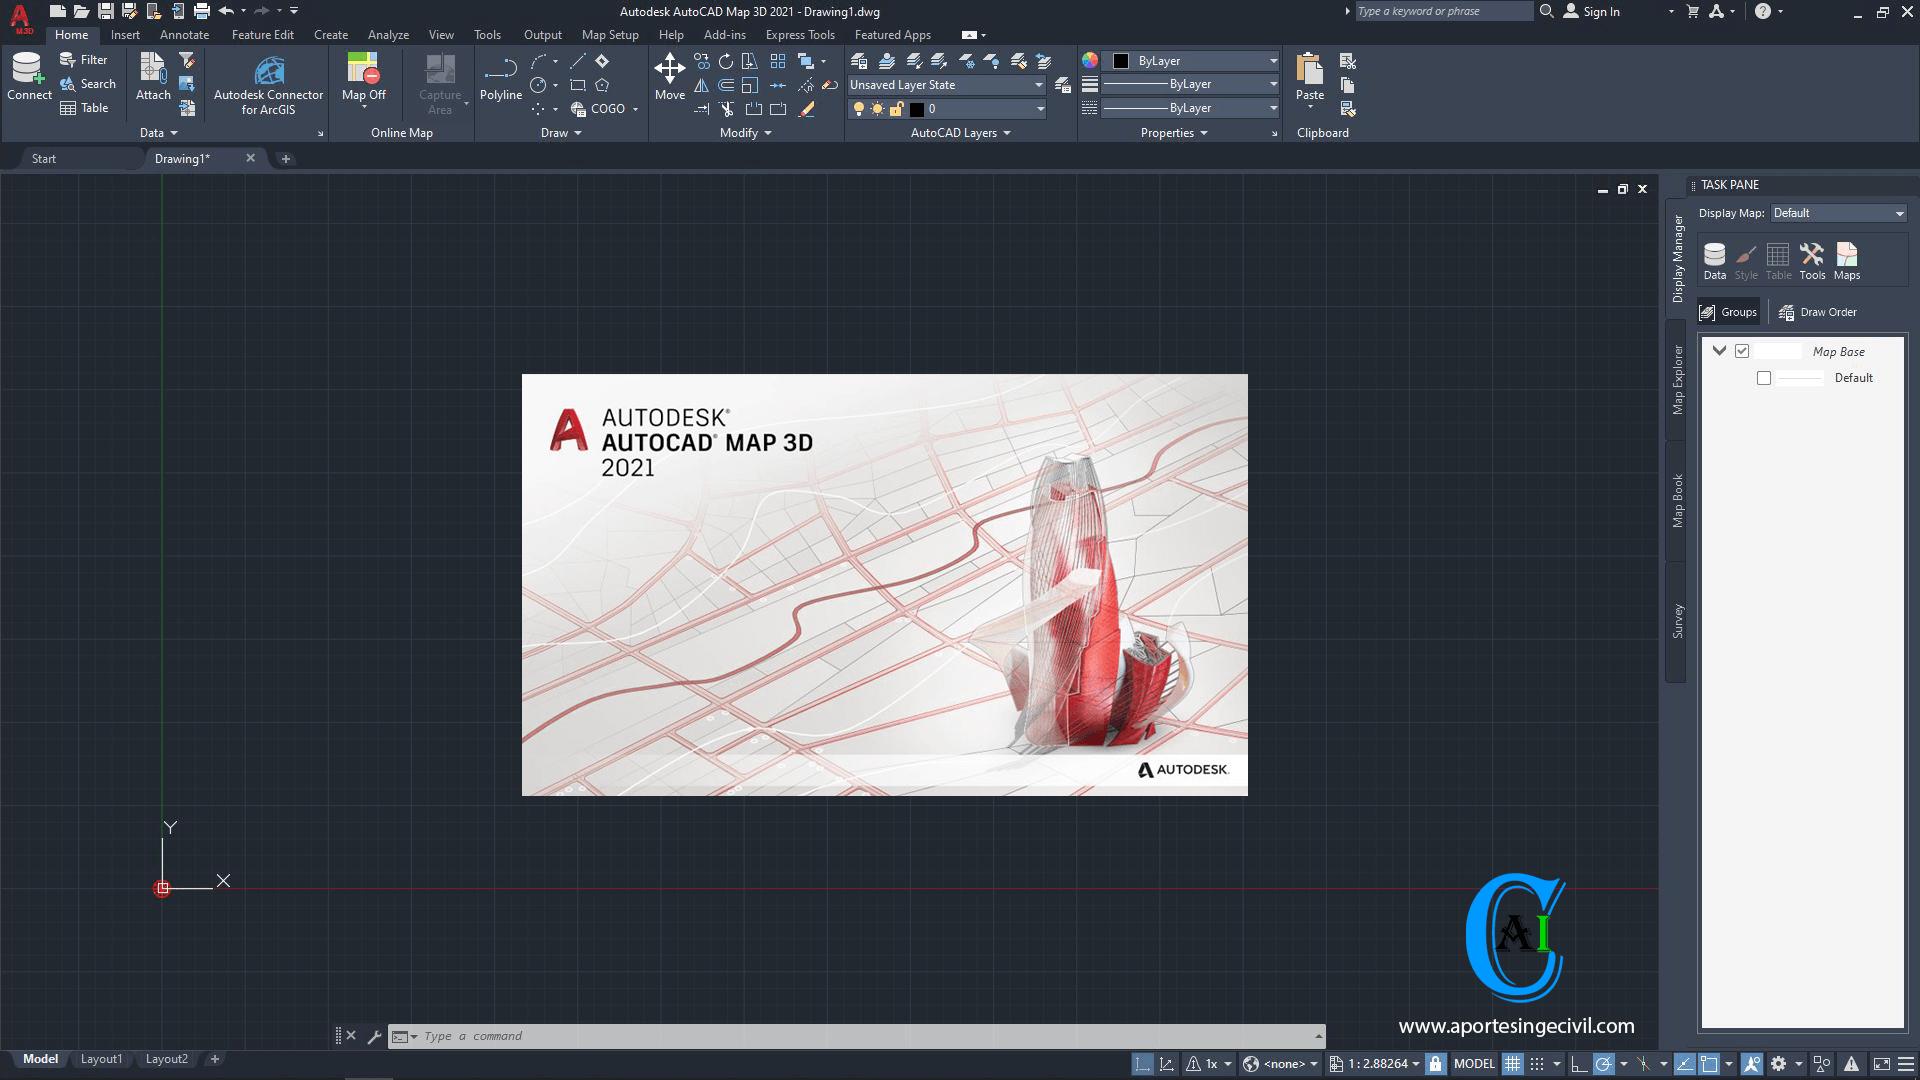 Autodesk Autocad Map 3d 2021 En Español E Ingles